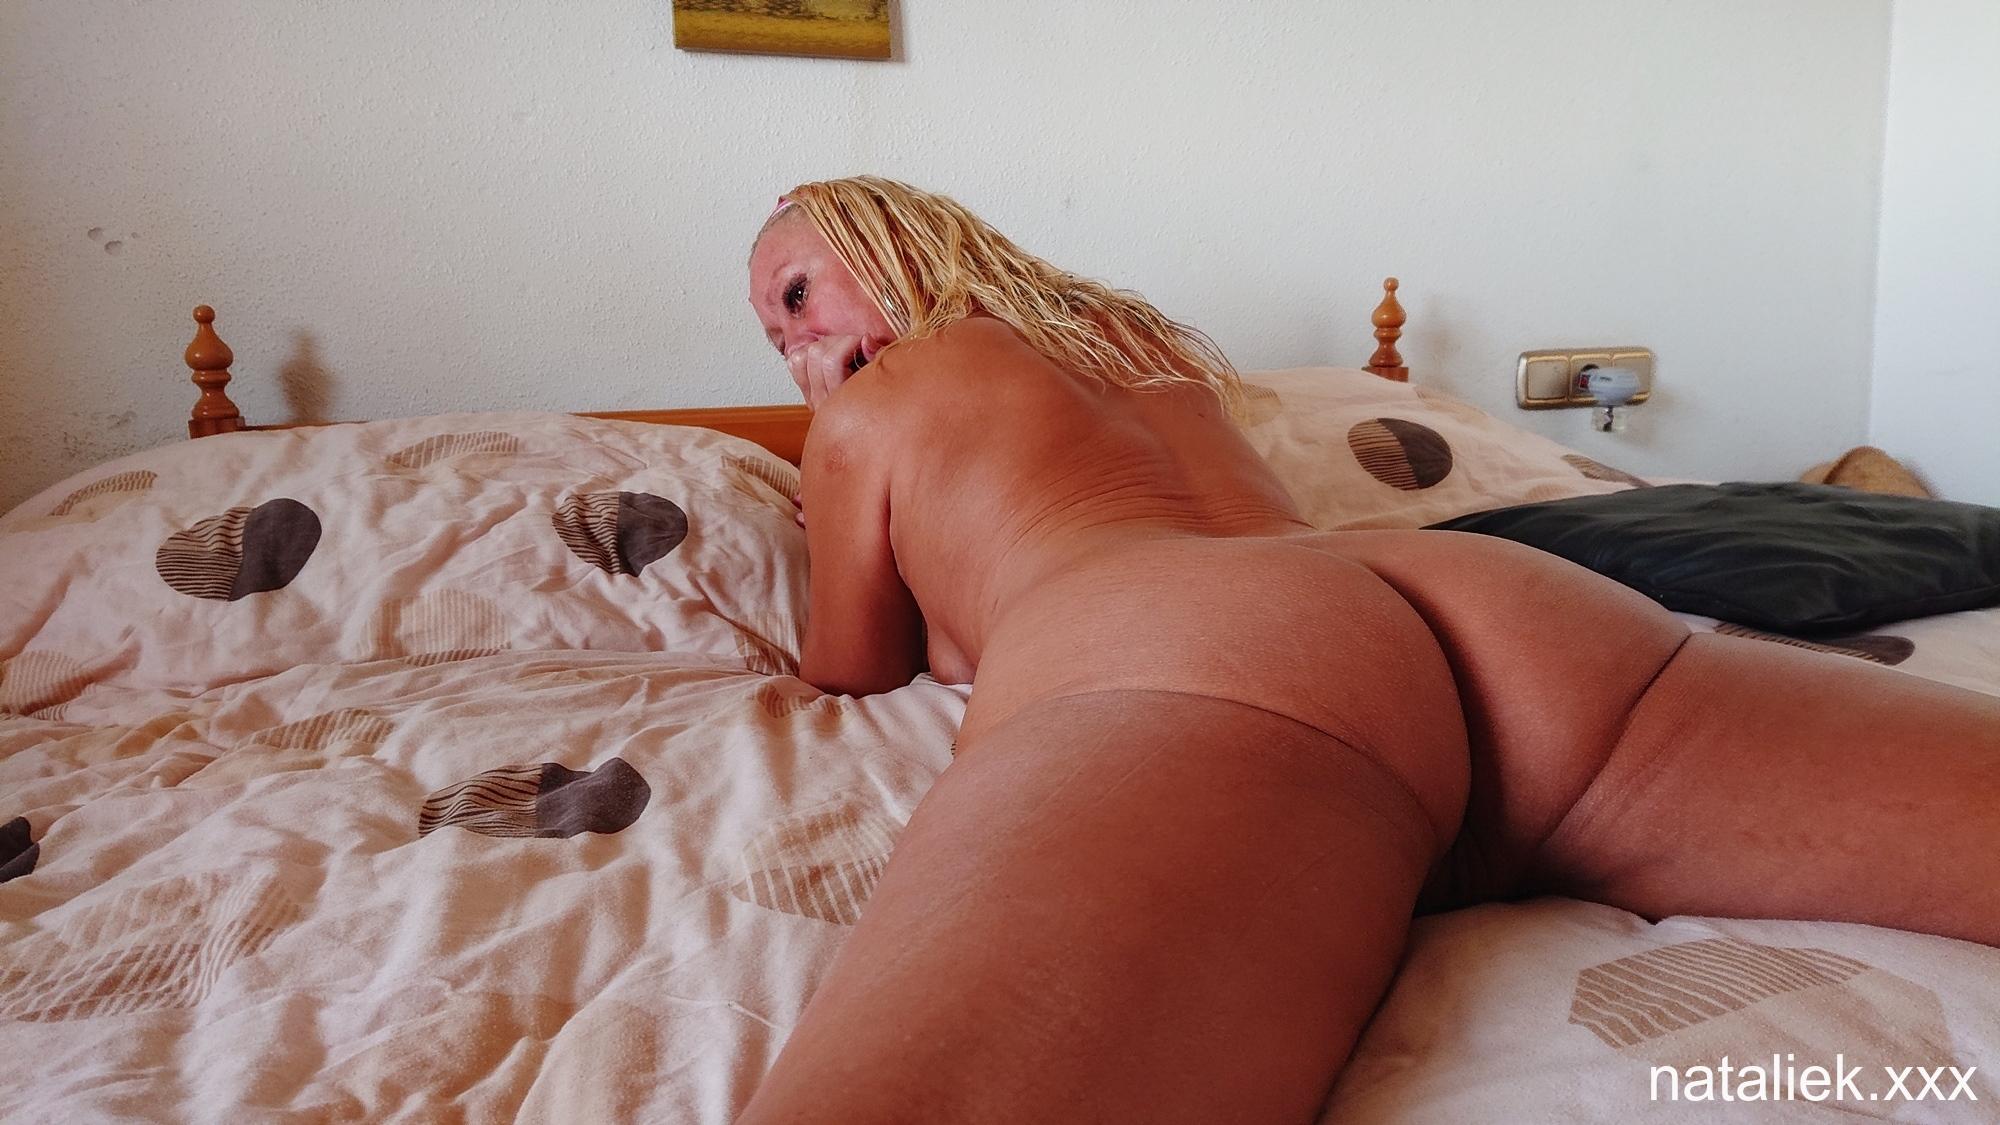 Masturbating Naked